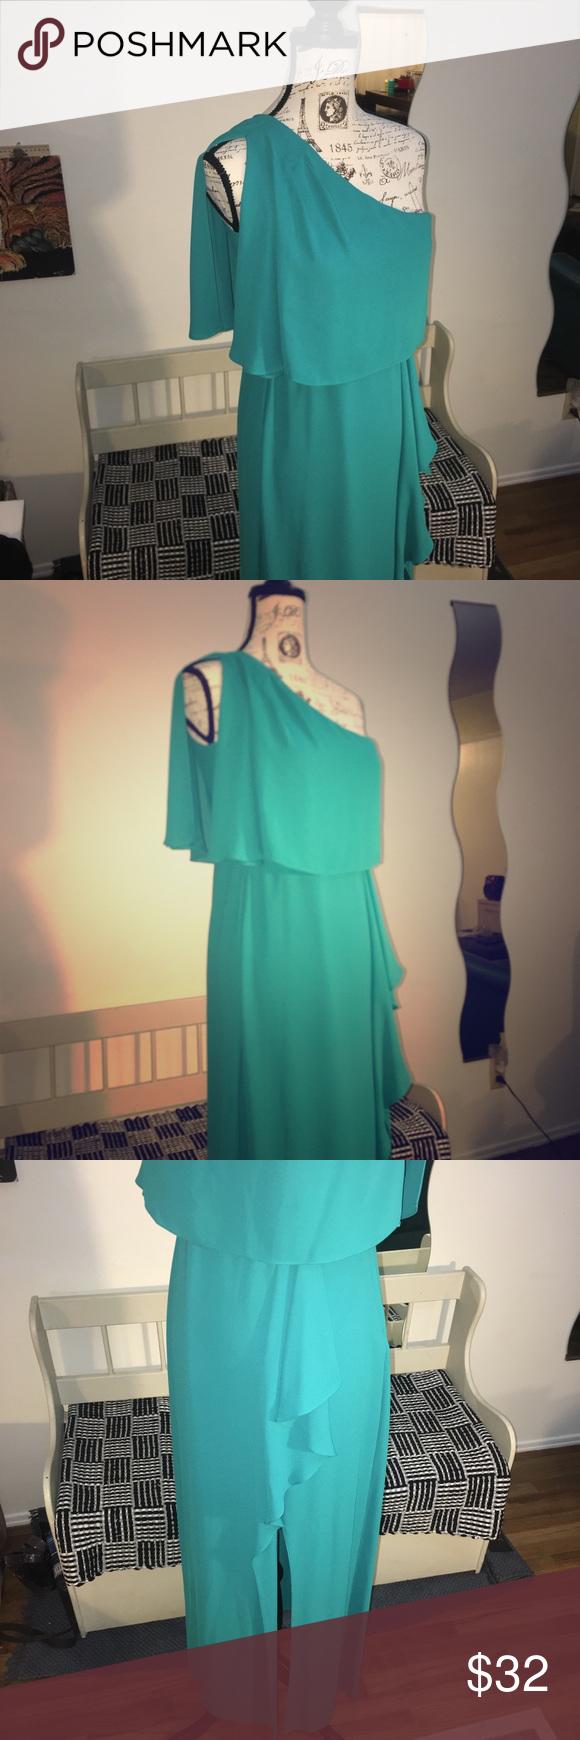 BCBG maxazria Teal one shoulder maxi Dress